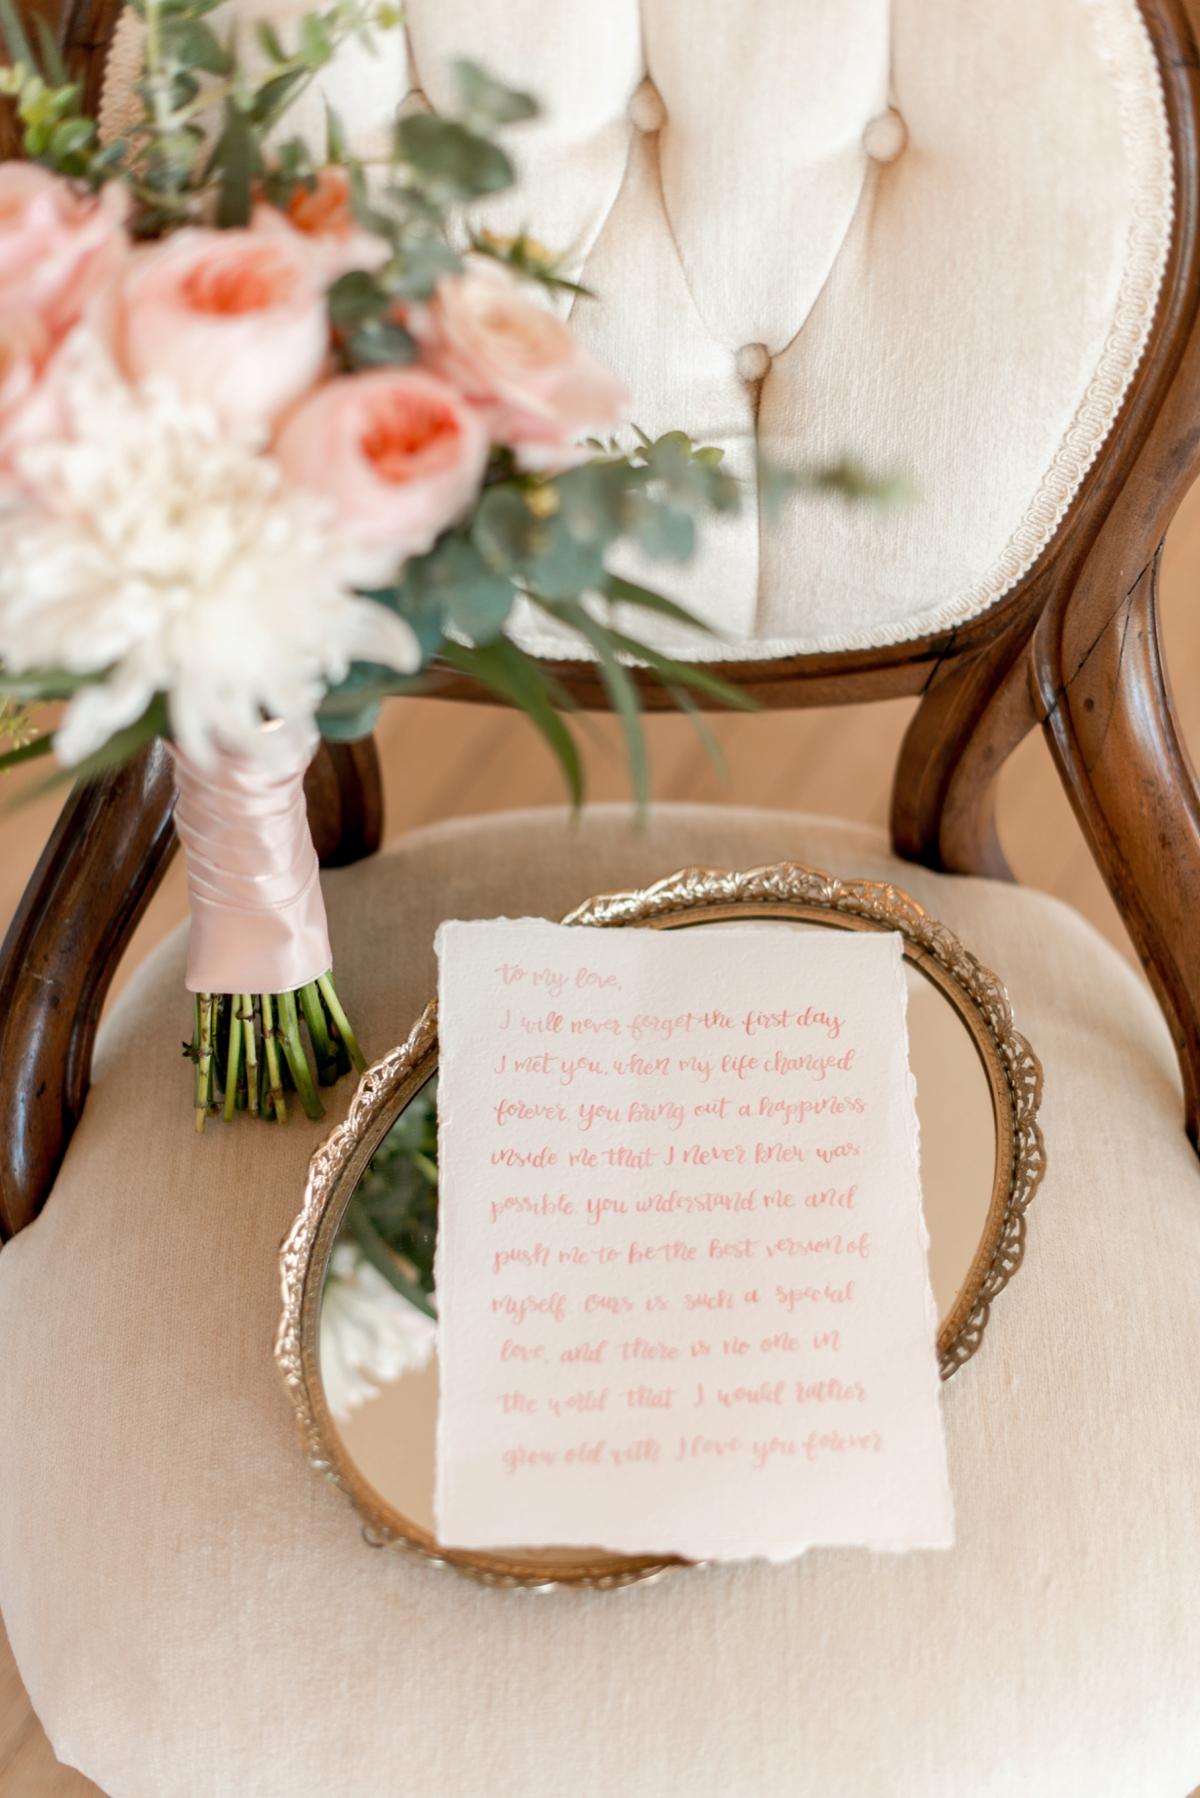 Elegant Calligraphy Inspired Wedding Ideas via TheELD.com